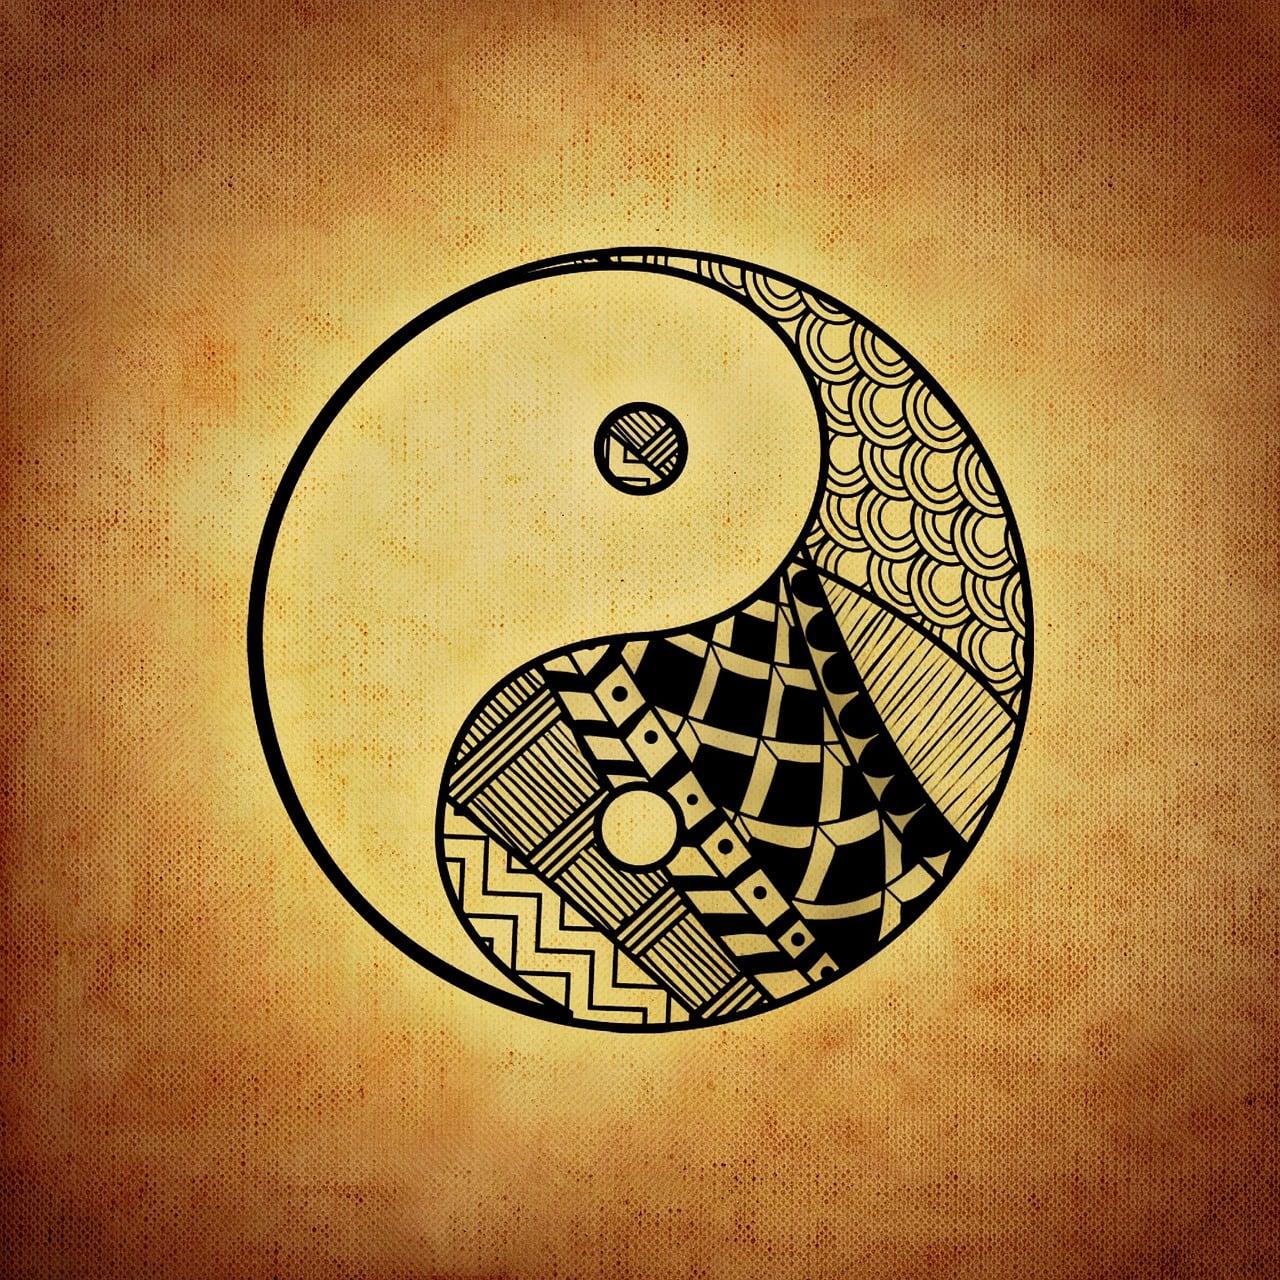 Yin Yang – Harmonija energij in teorija polarnosti 1